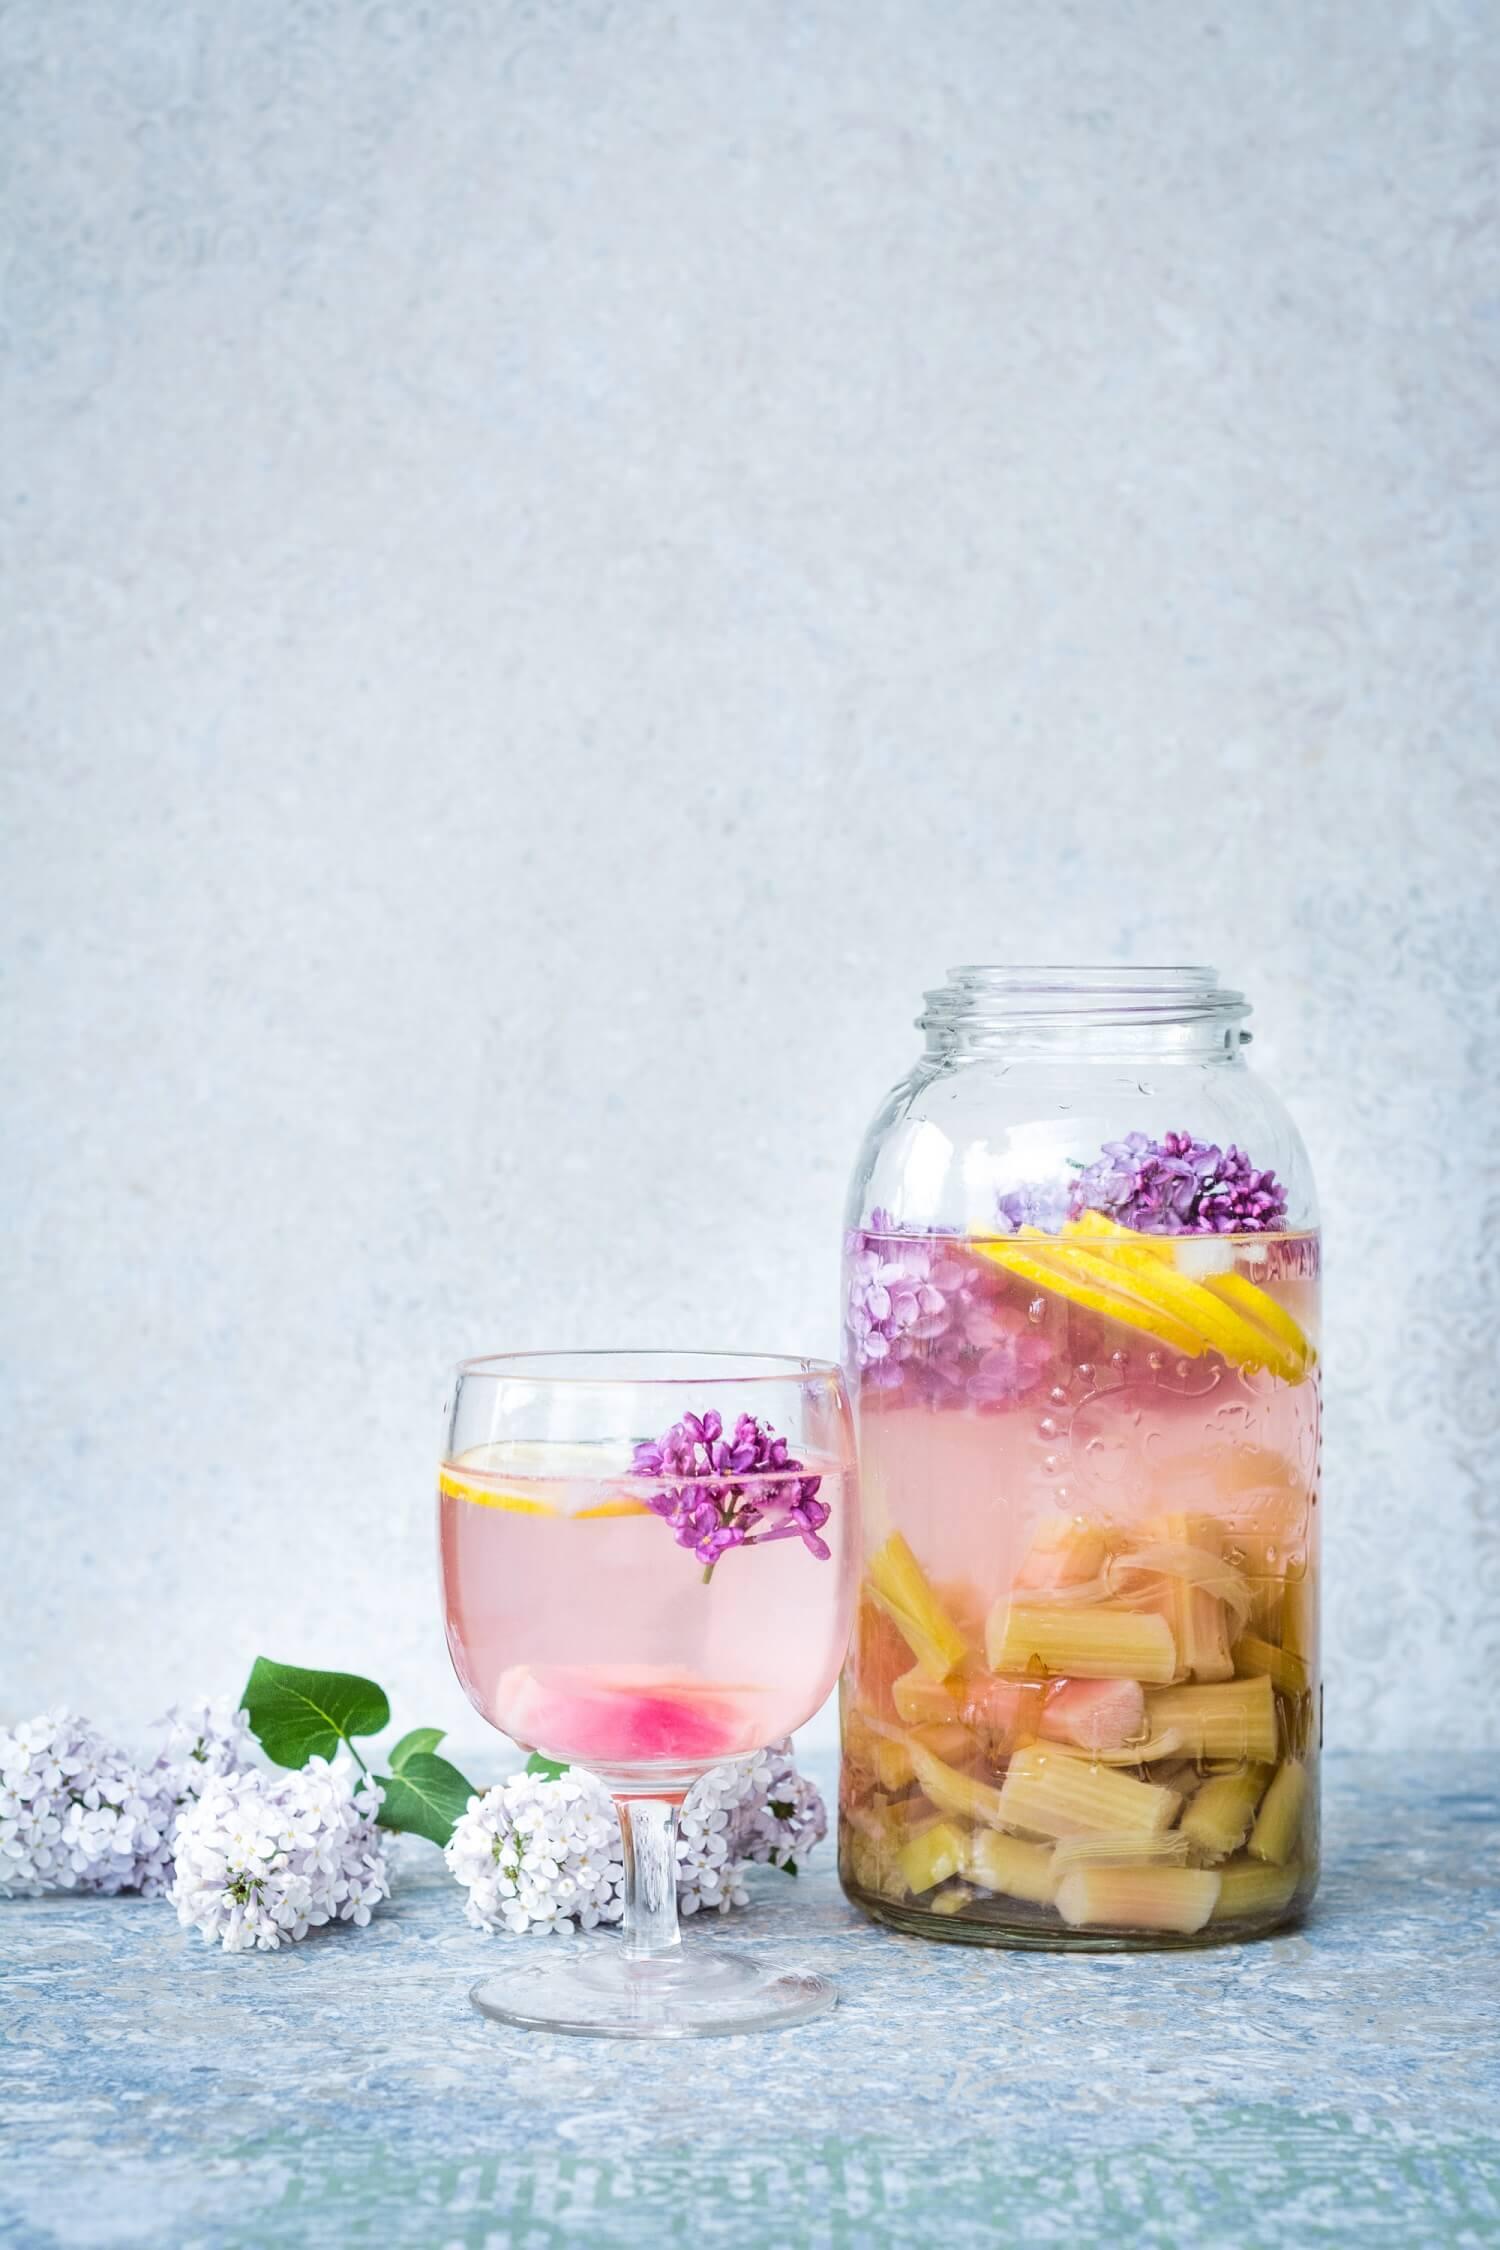 Limonade à la rhubarbe zéro gaspi